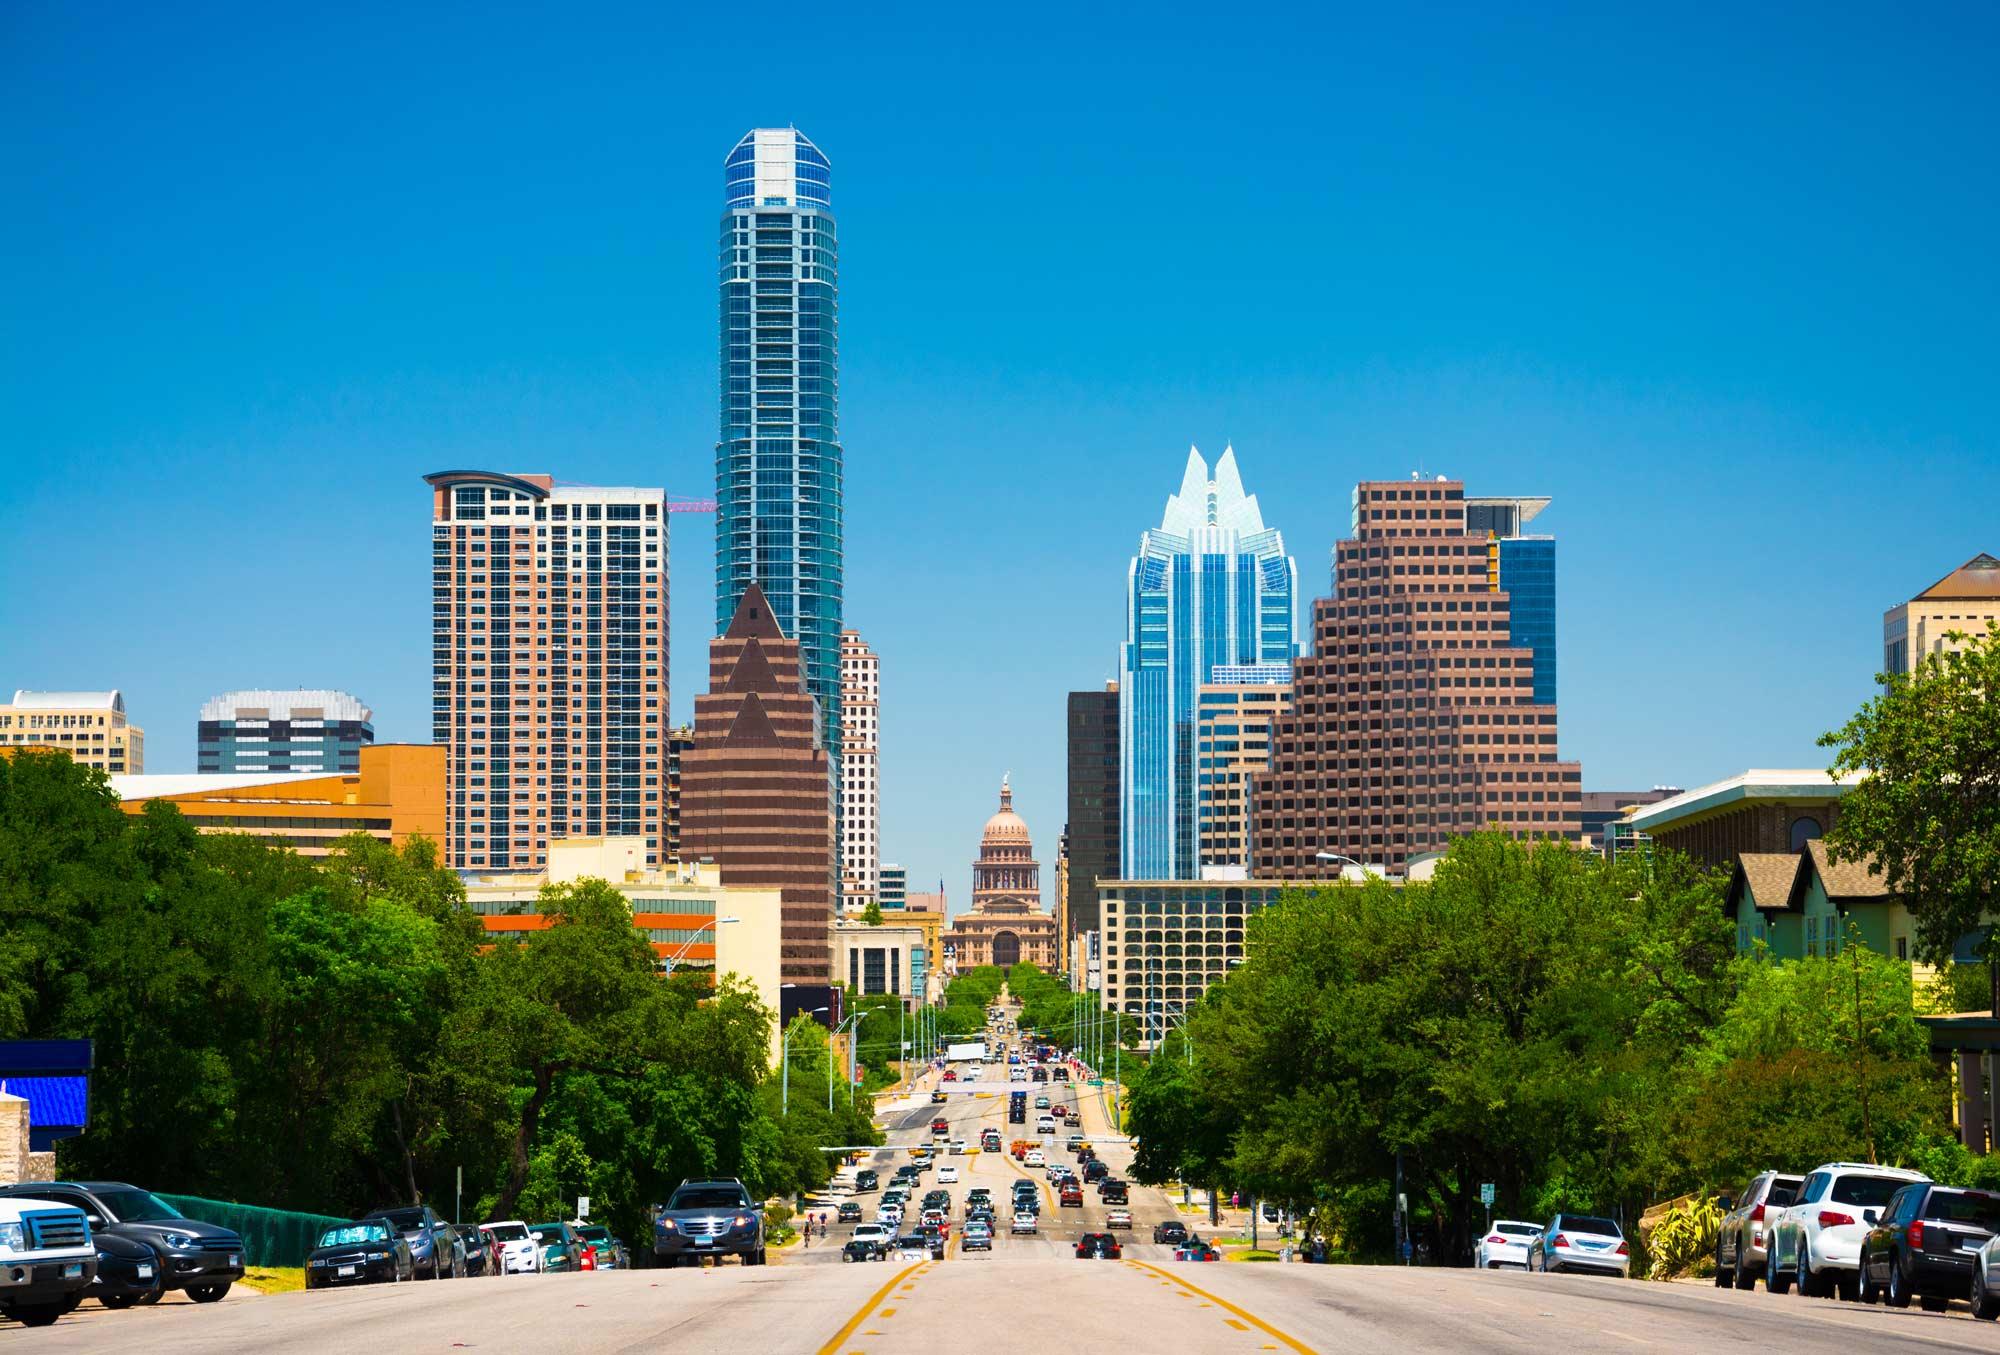 TrueNoord look forward to seeing you at ISTAT Americas 2020 in Austin, Texas.